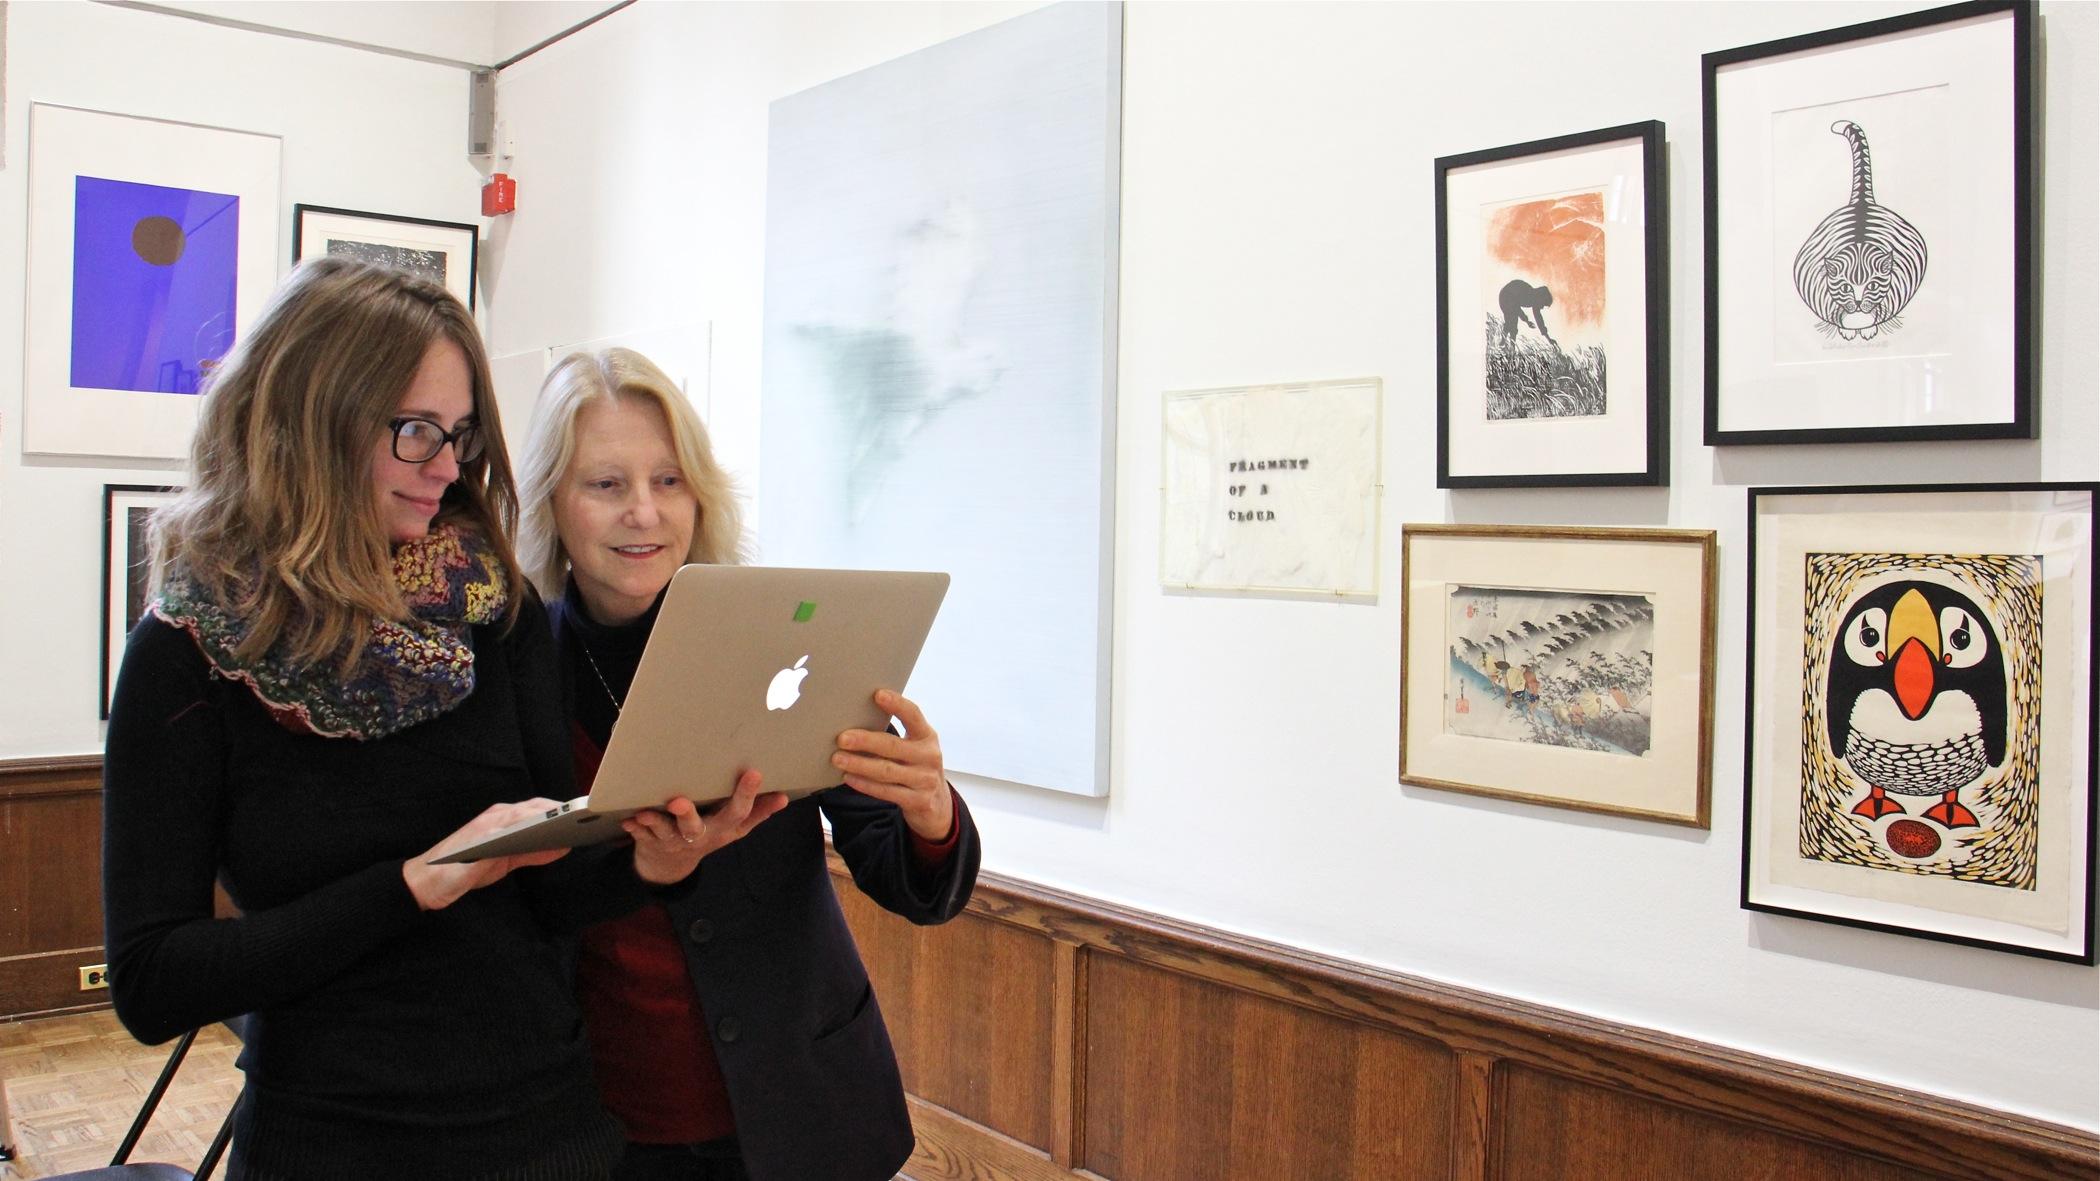 Associate Curator Heather Moqtaderi (left) confers with Lynn Marsden-Atlass, executive director of the Arthur Ross Gallery at the University of Pennsylvania.